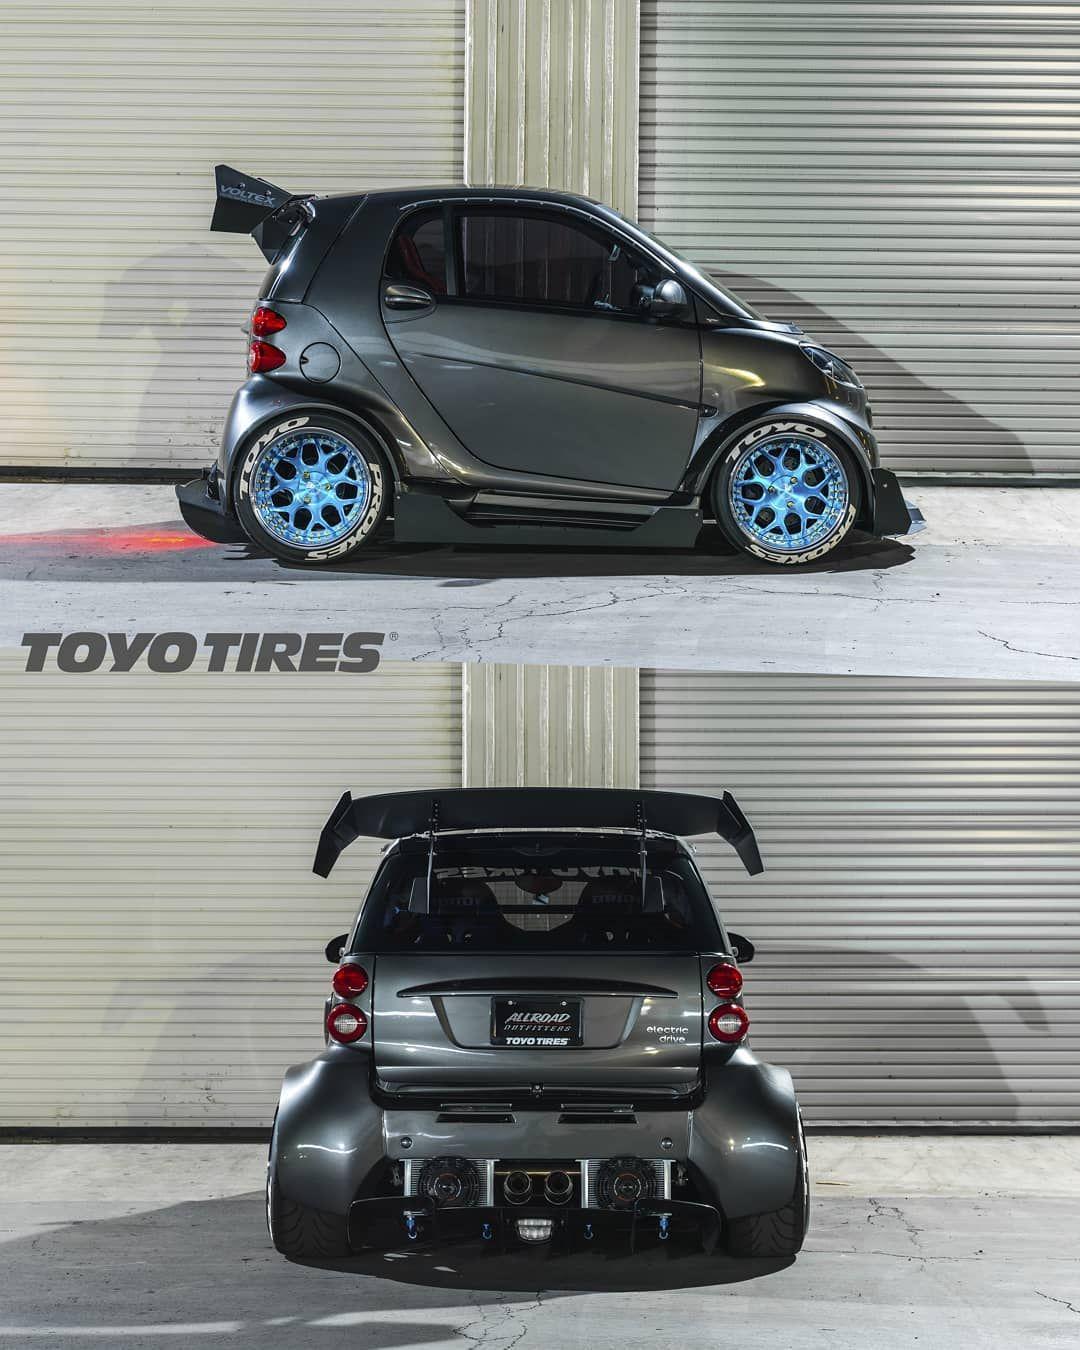 The Infamous Smart Car Thesmartcar Instagram Mug Shot Smartcar